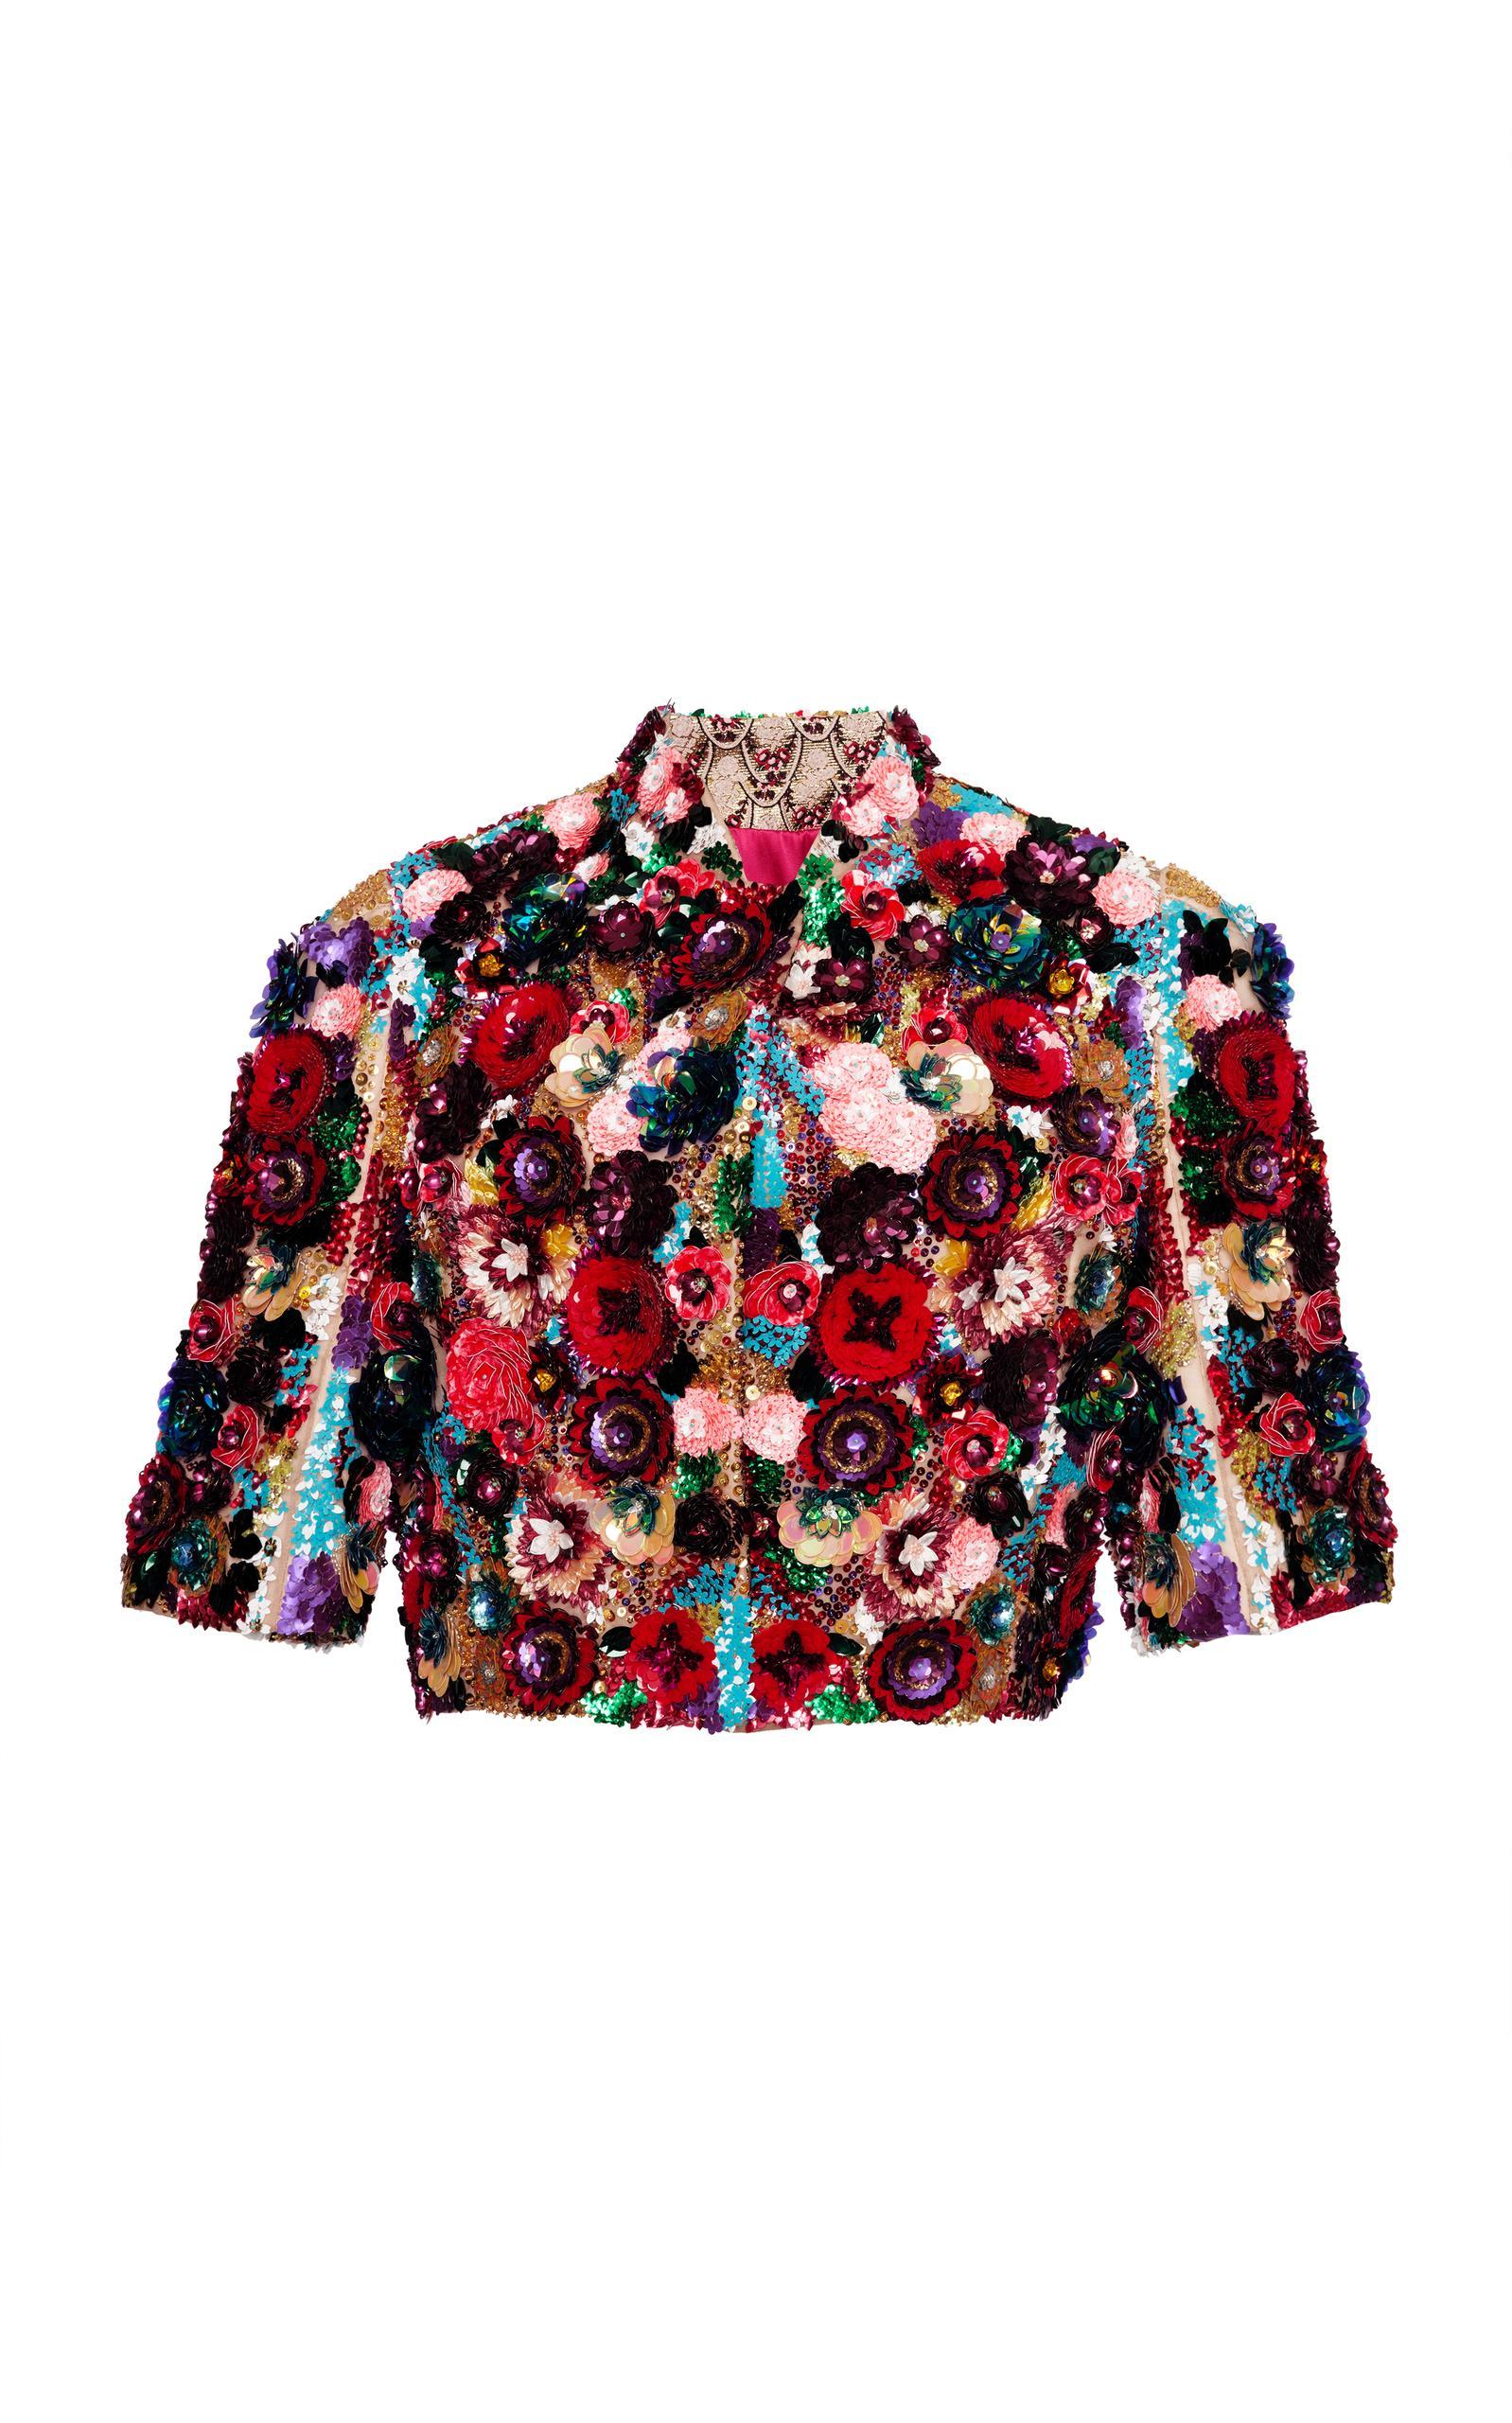 Dolce & Gabbana Embellished Bolero In Multi